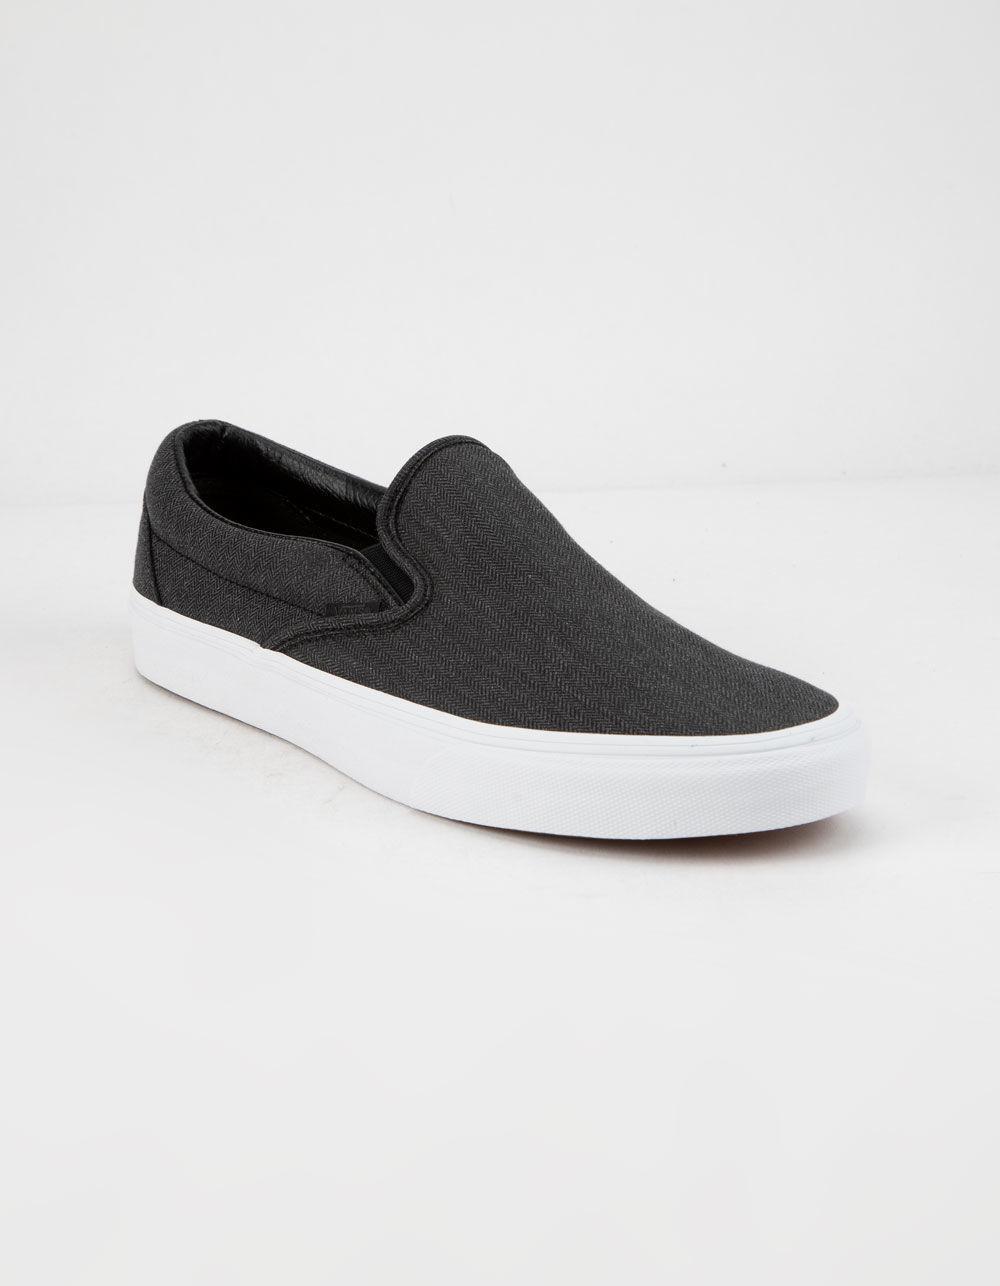 7b173488afbba4 Lyst - Vans Herringbone Classic Slip-on Mens Shoes in Black for Men - Save  8%